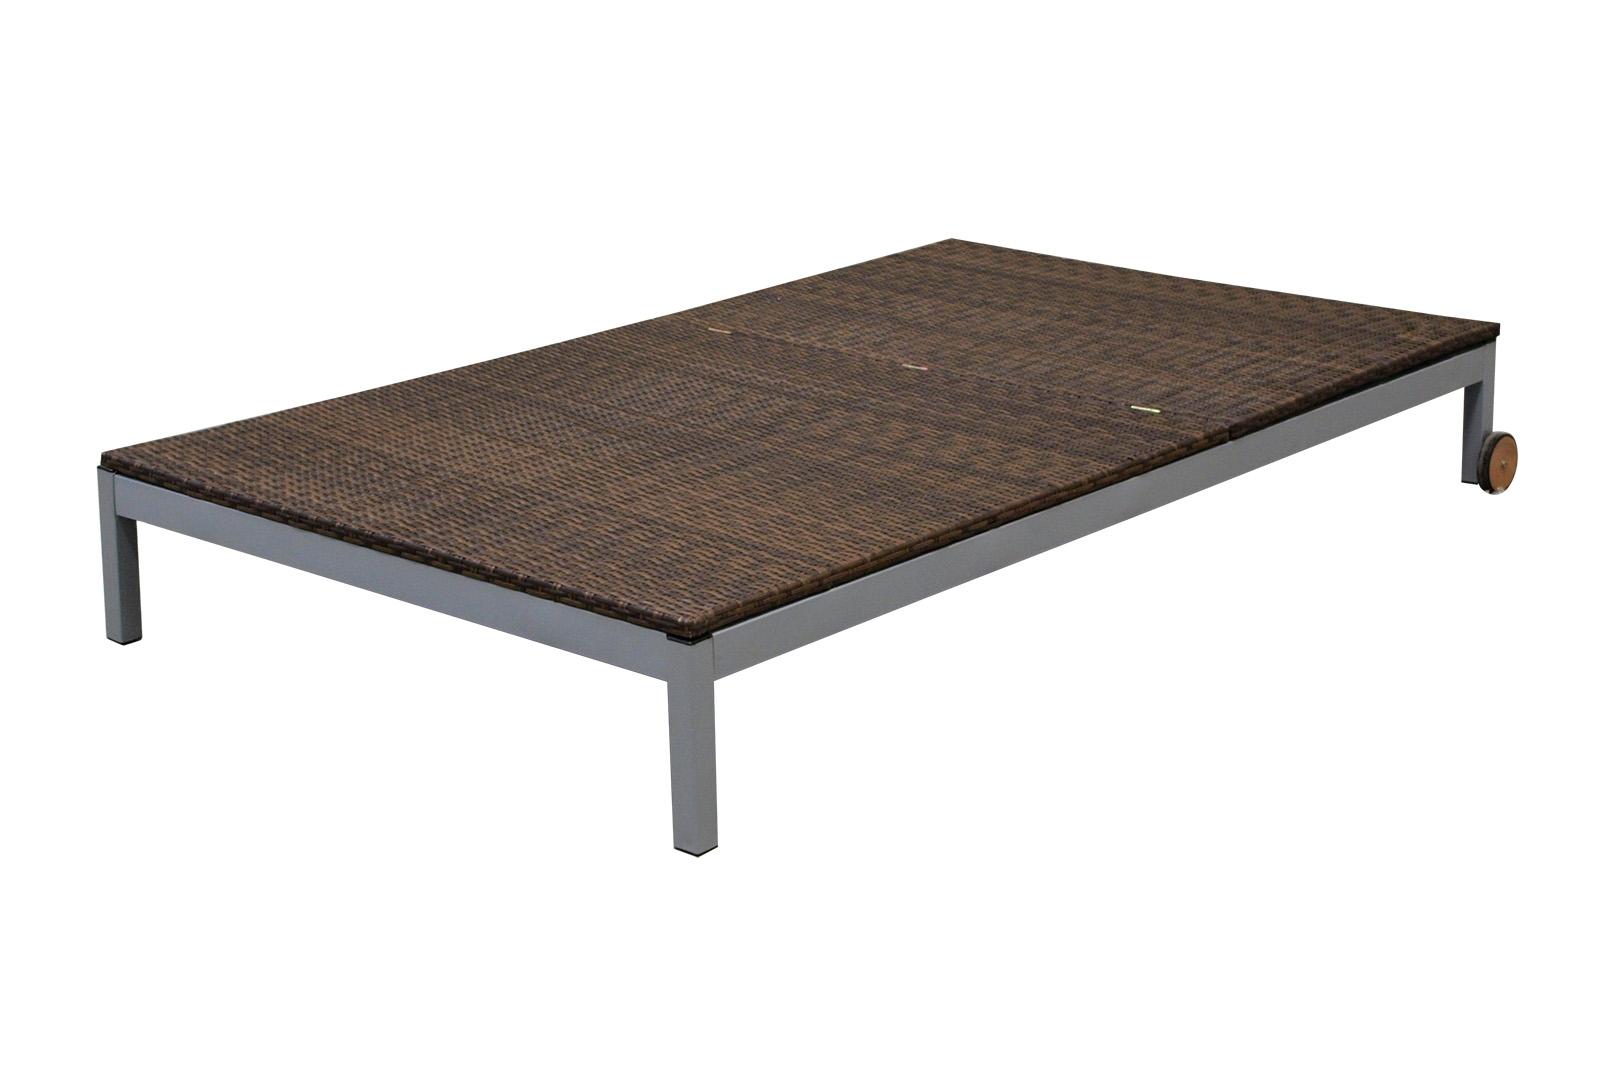 doppel sonnenliege rollenliege liege fiorenzo metall geflecht mocca 2 wahl ebay. Black Bedroom Furniture Sets. Home Design Ideas